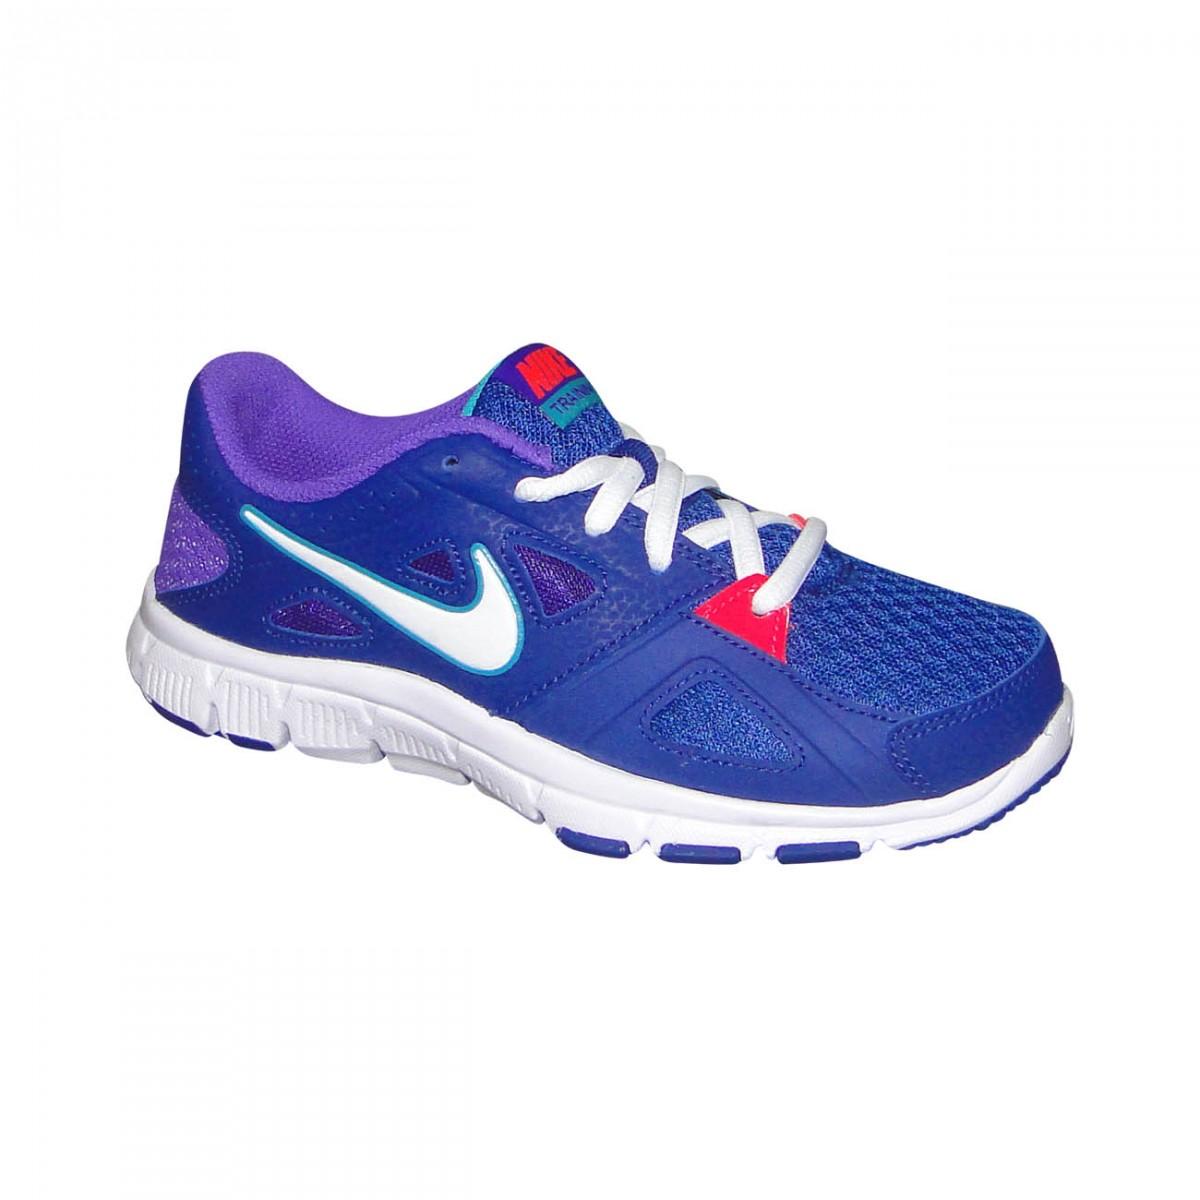 0716fb3bdc Tenis Nike Flex Supreme Tr 2 Infantil 598873 403 - Azul Branco Lilas -  Chuteira Nike